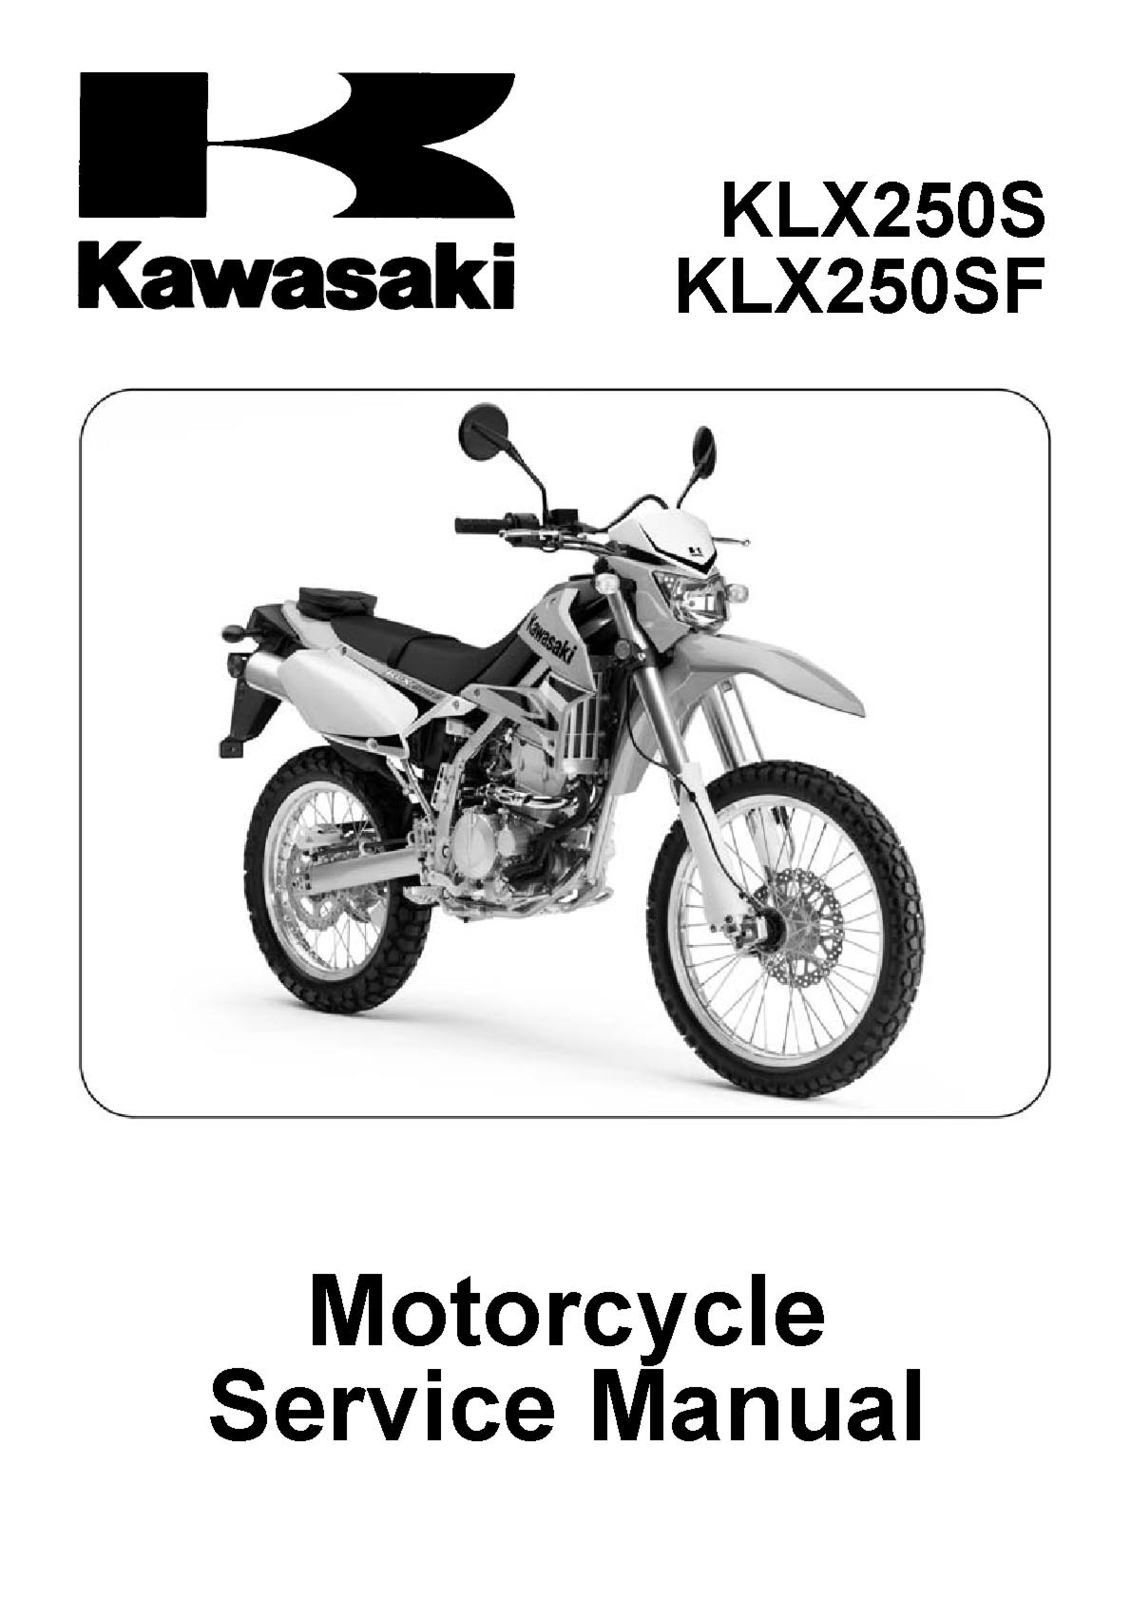 Klx250s sf